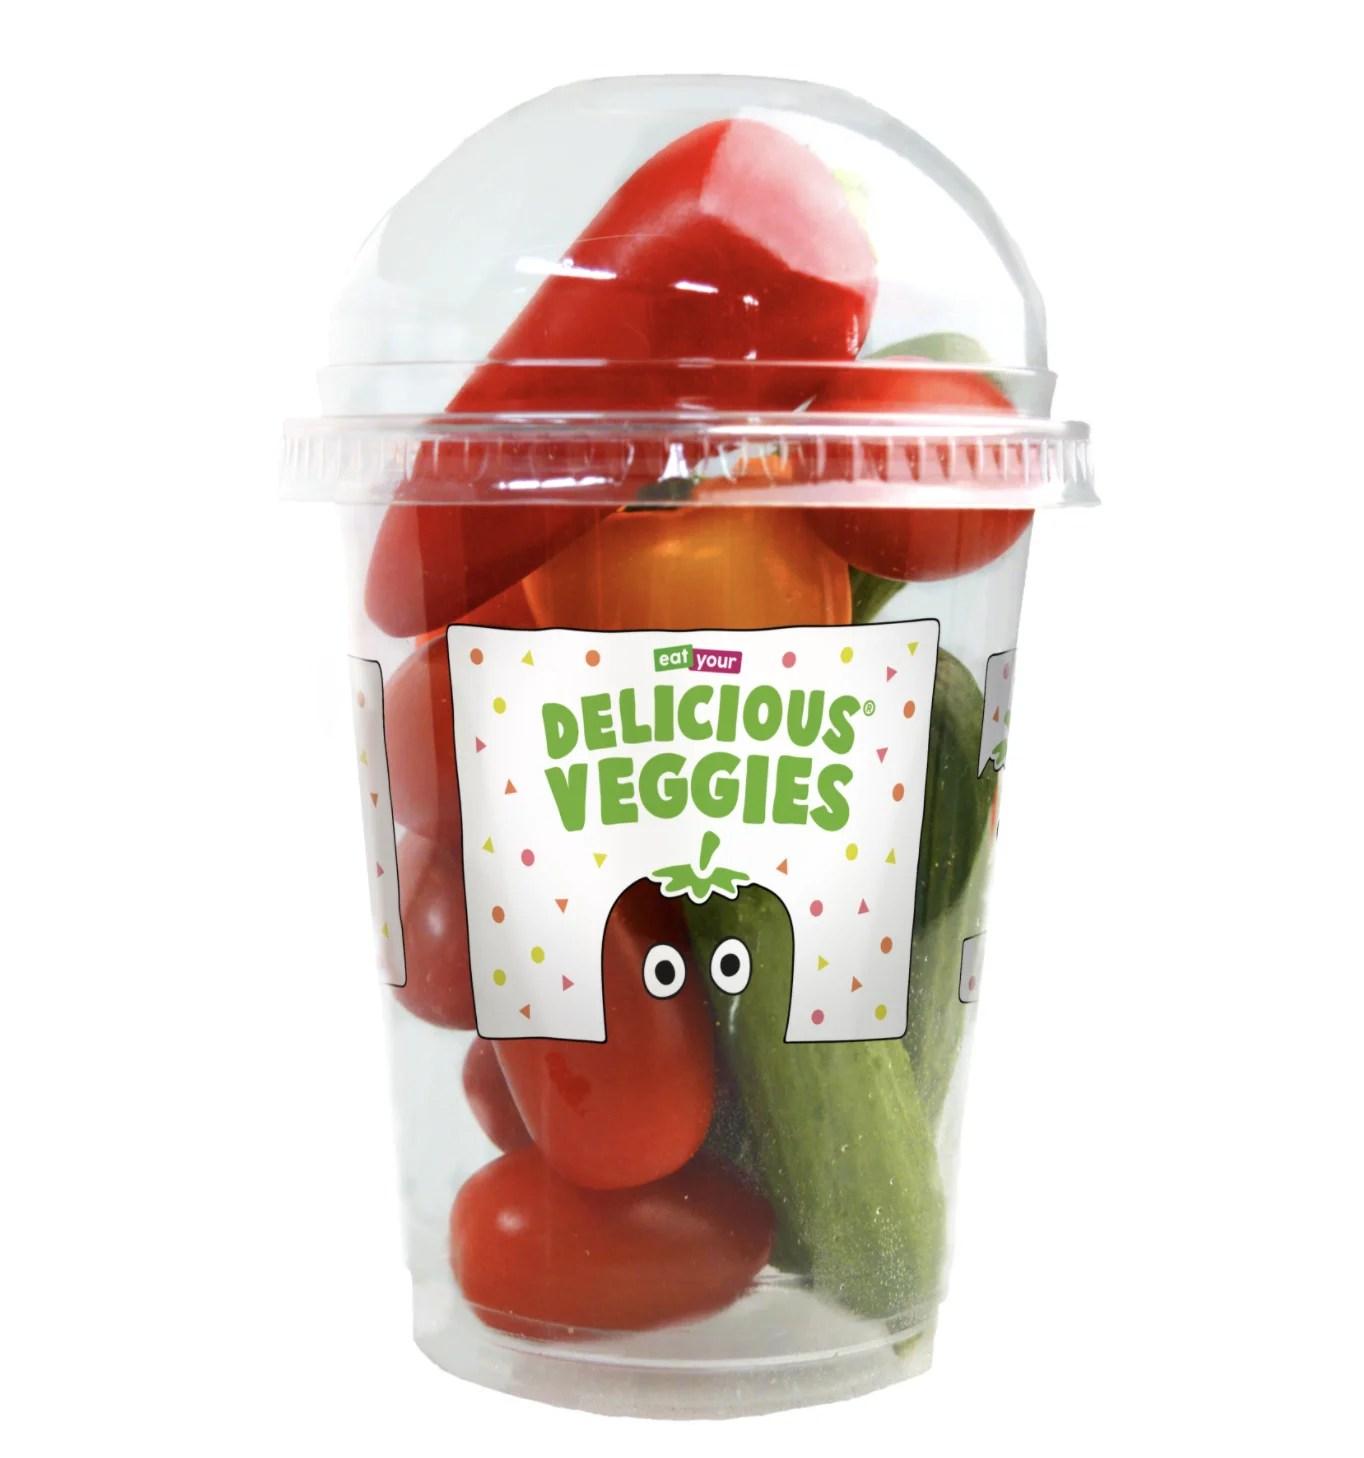 Delicious Veggies – portfolio shaker angelineau